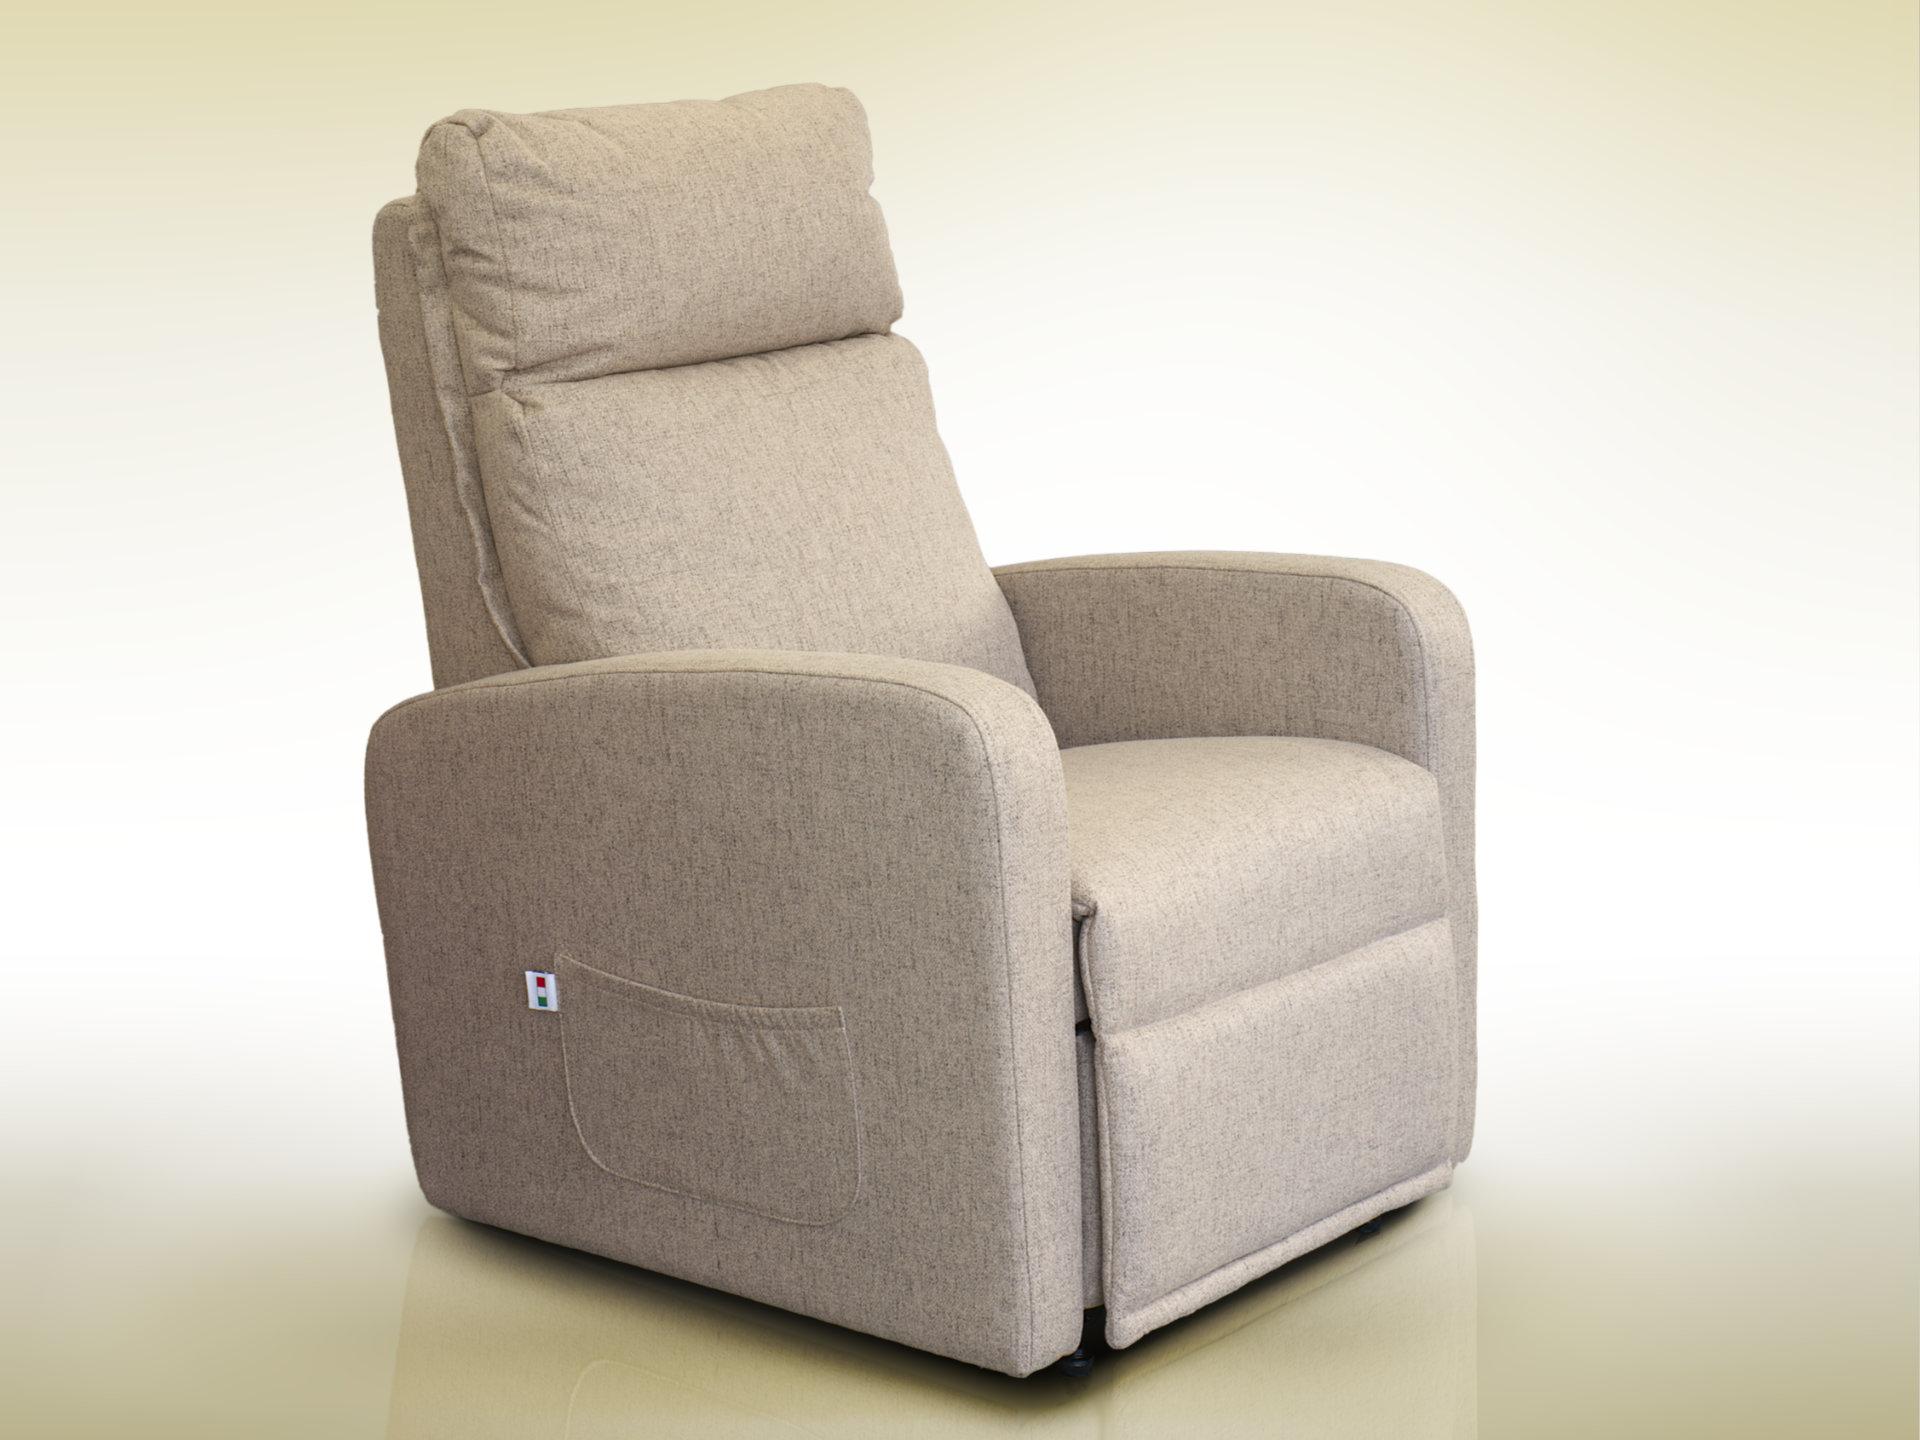 Poltrona per anziani reclinabile italiana